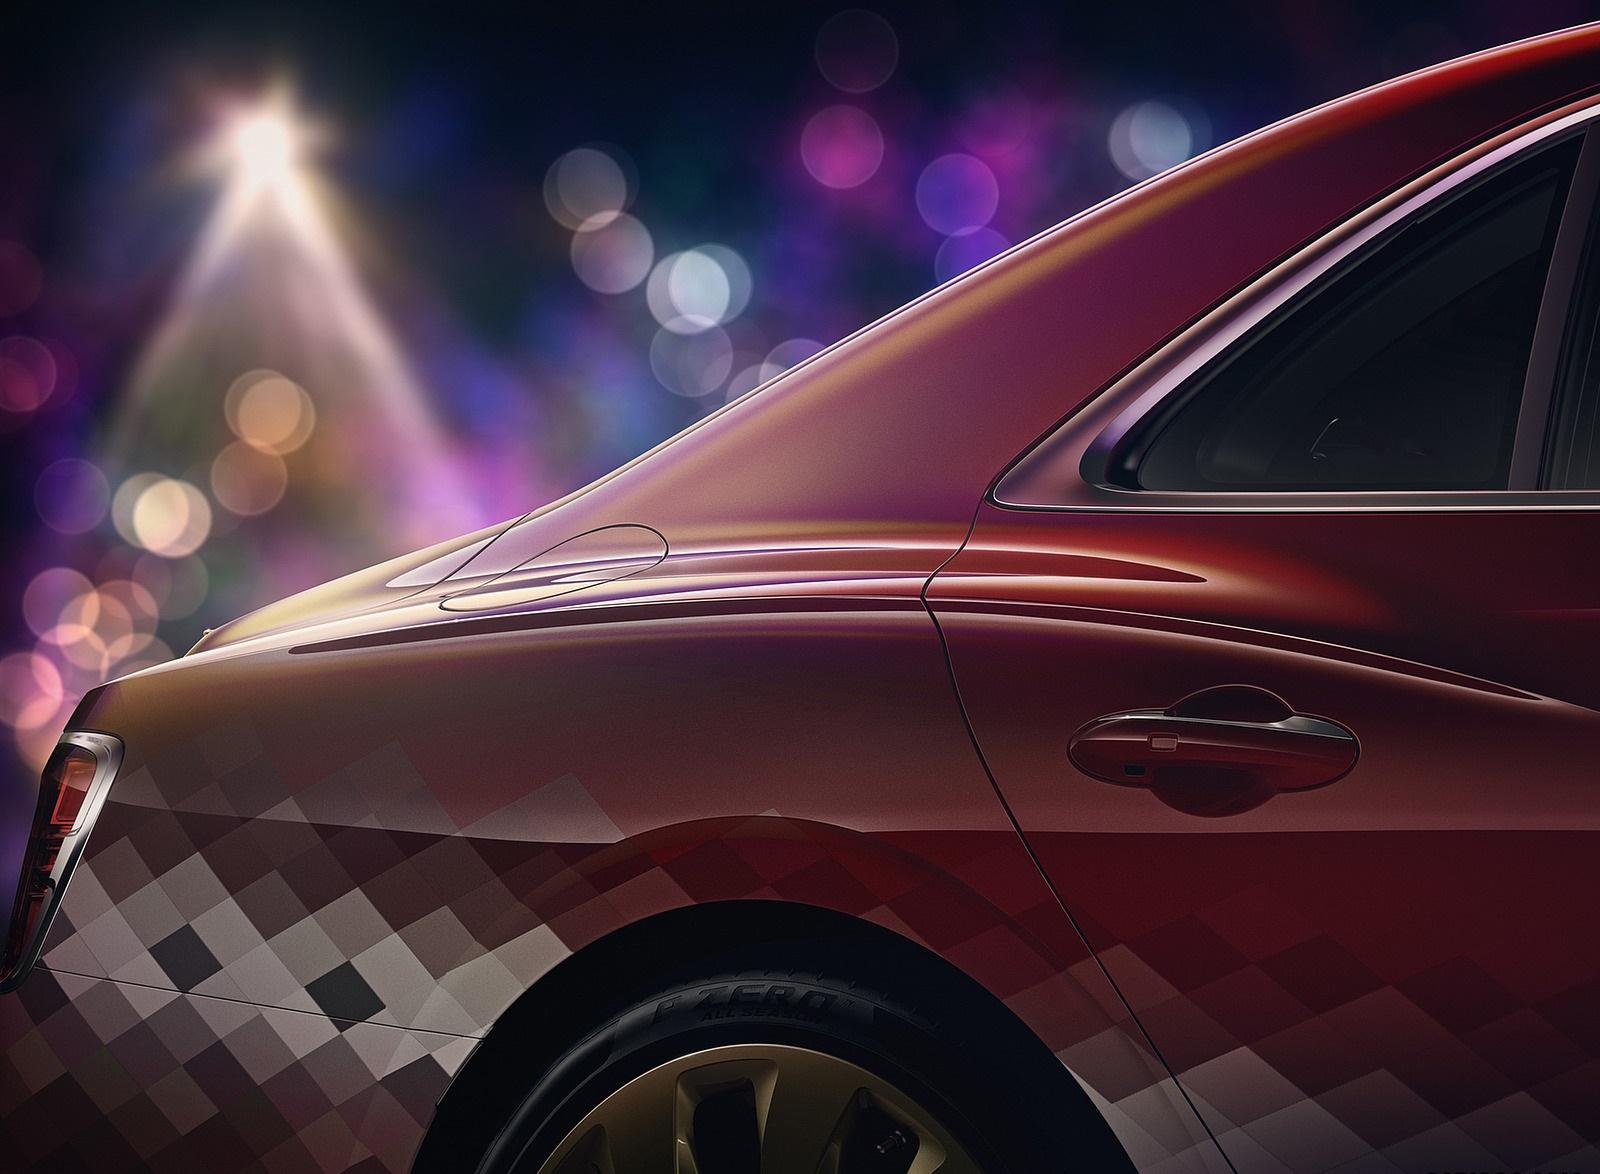 2021 Bentley Flying Spur V8 Reindeer Eight Detail Wallpapers (4)